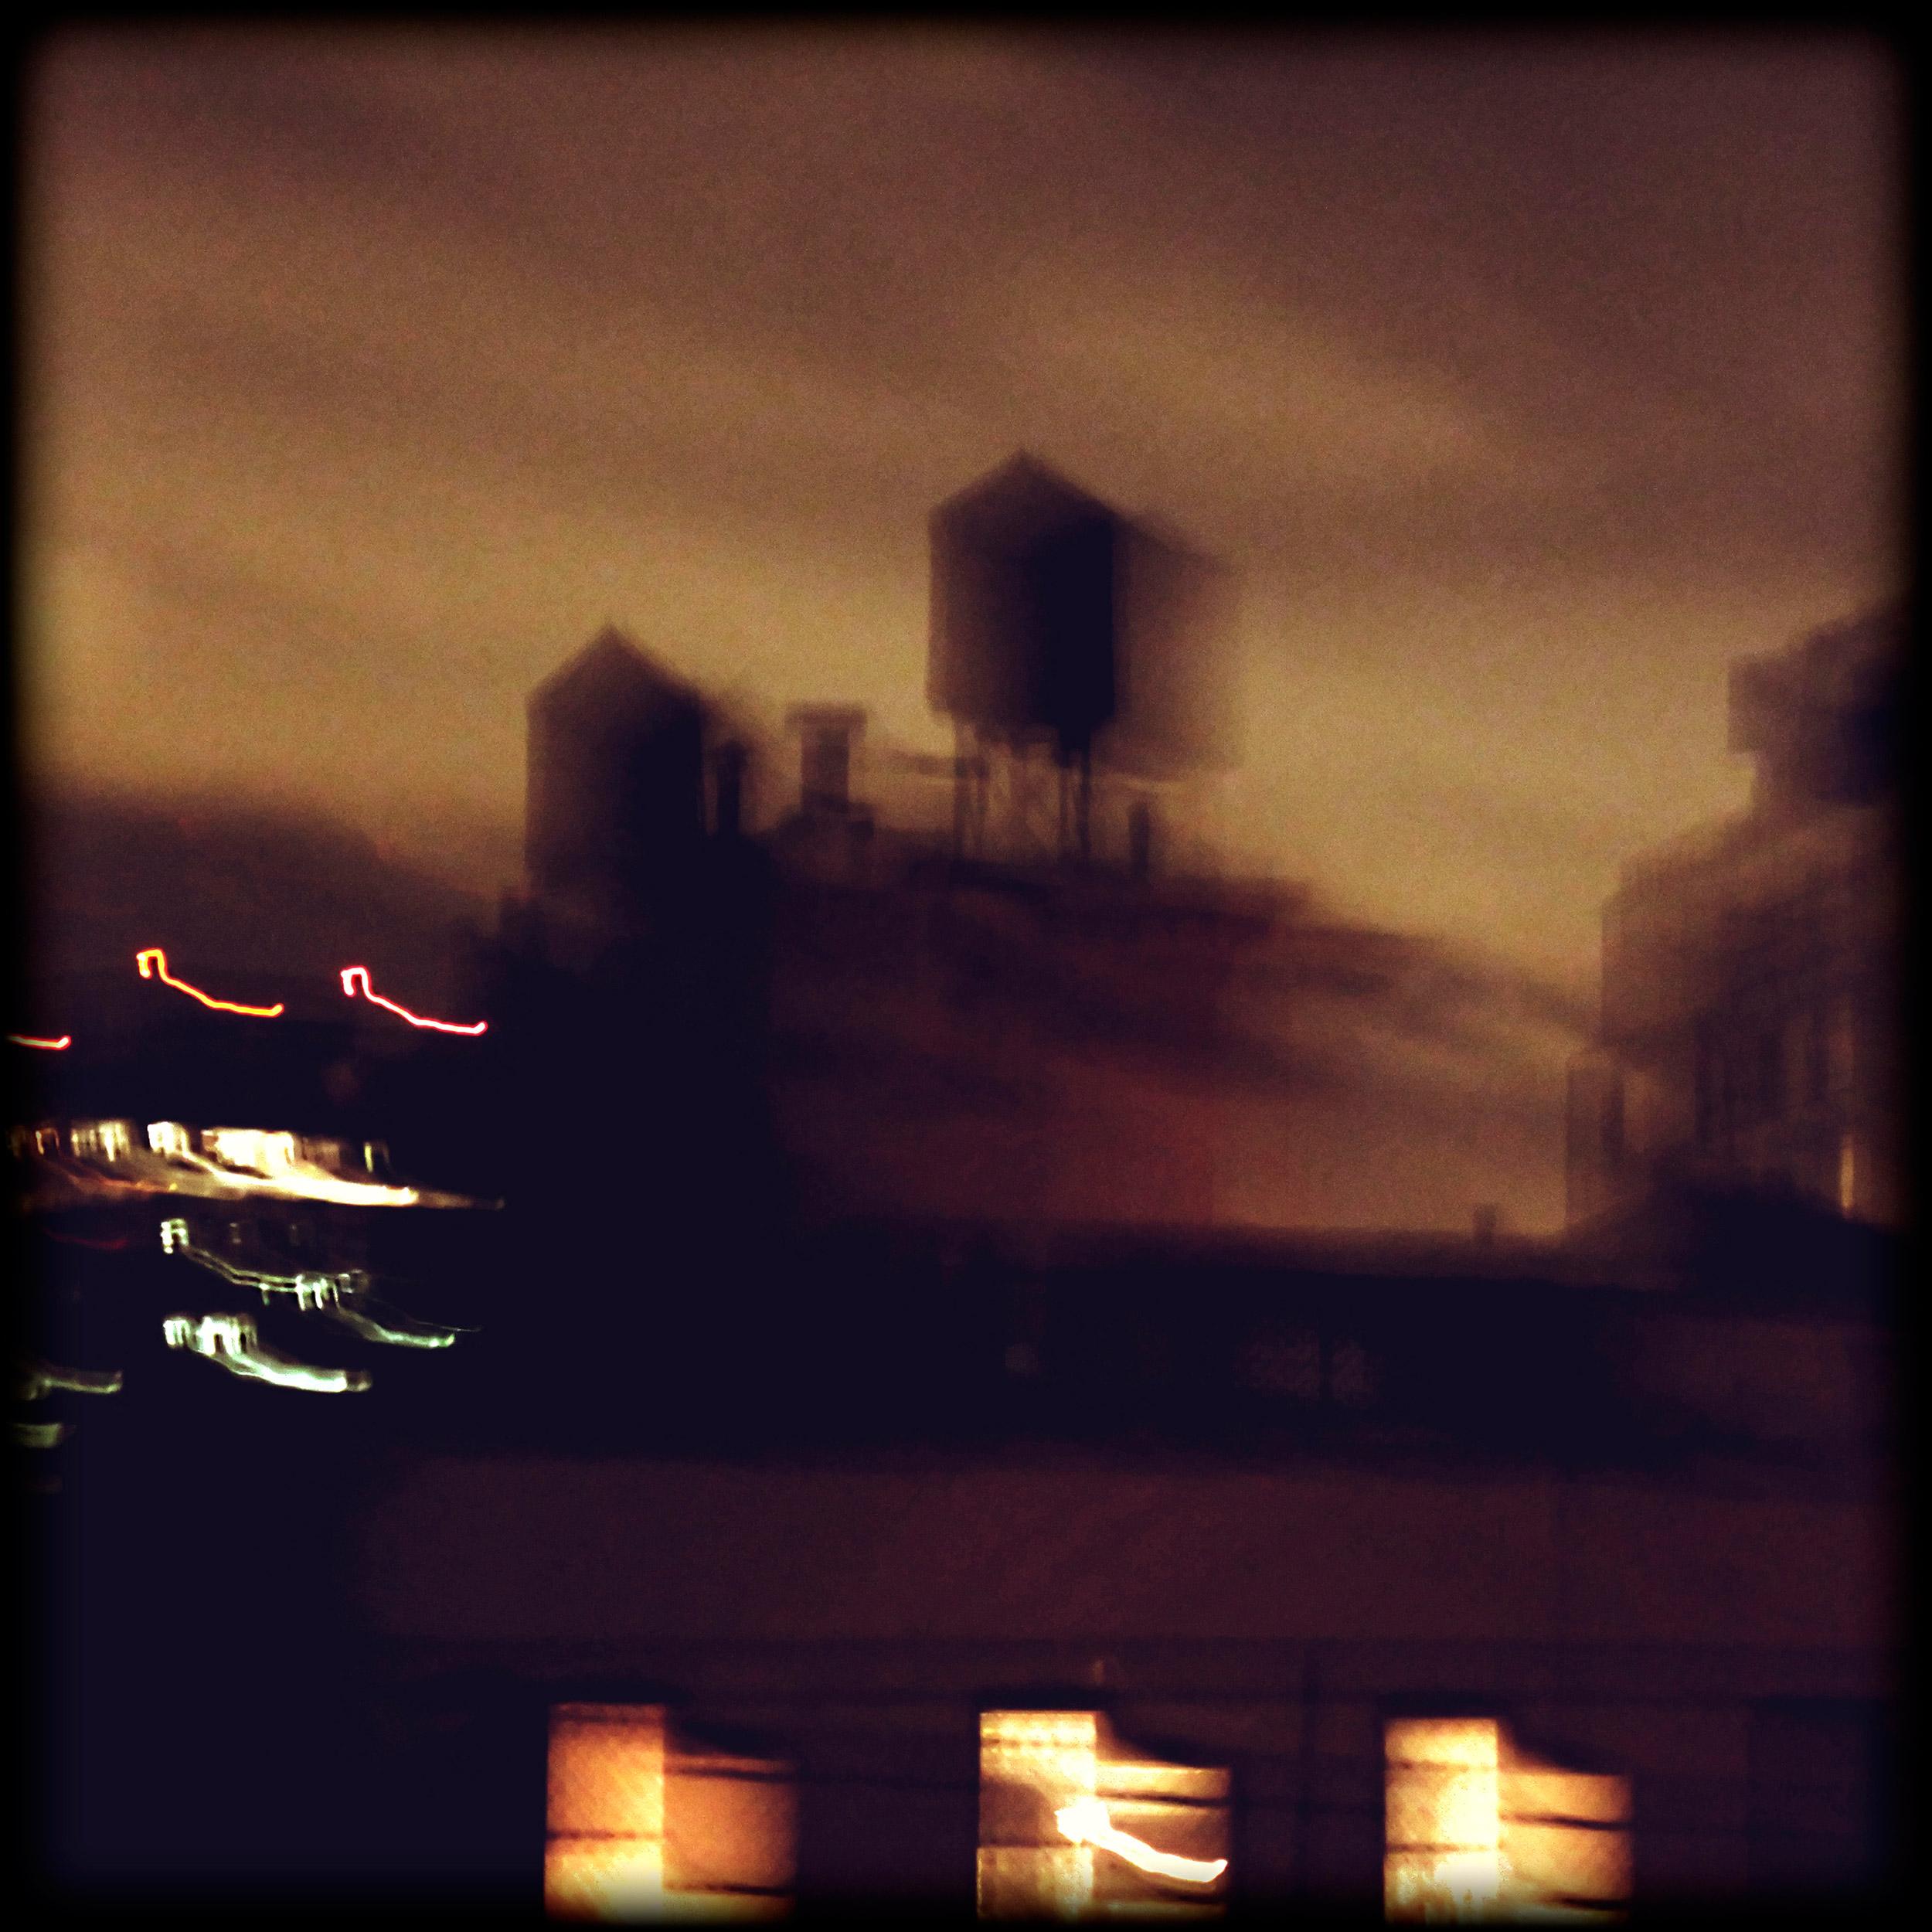 Ney-york-roof-web-.jpg